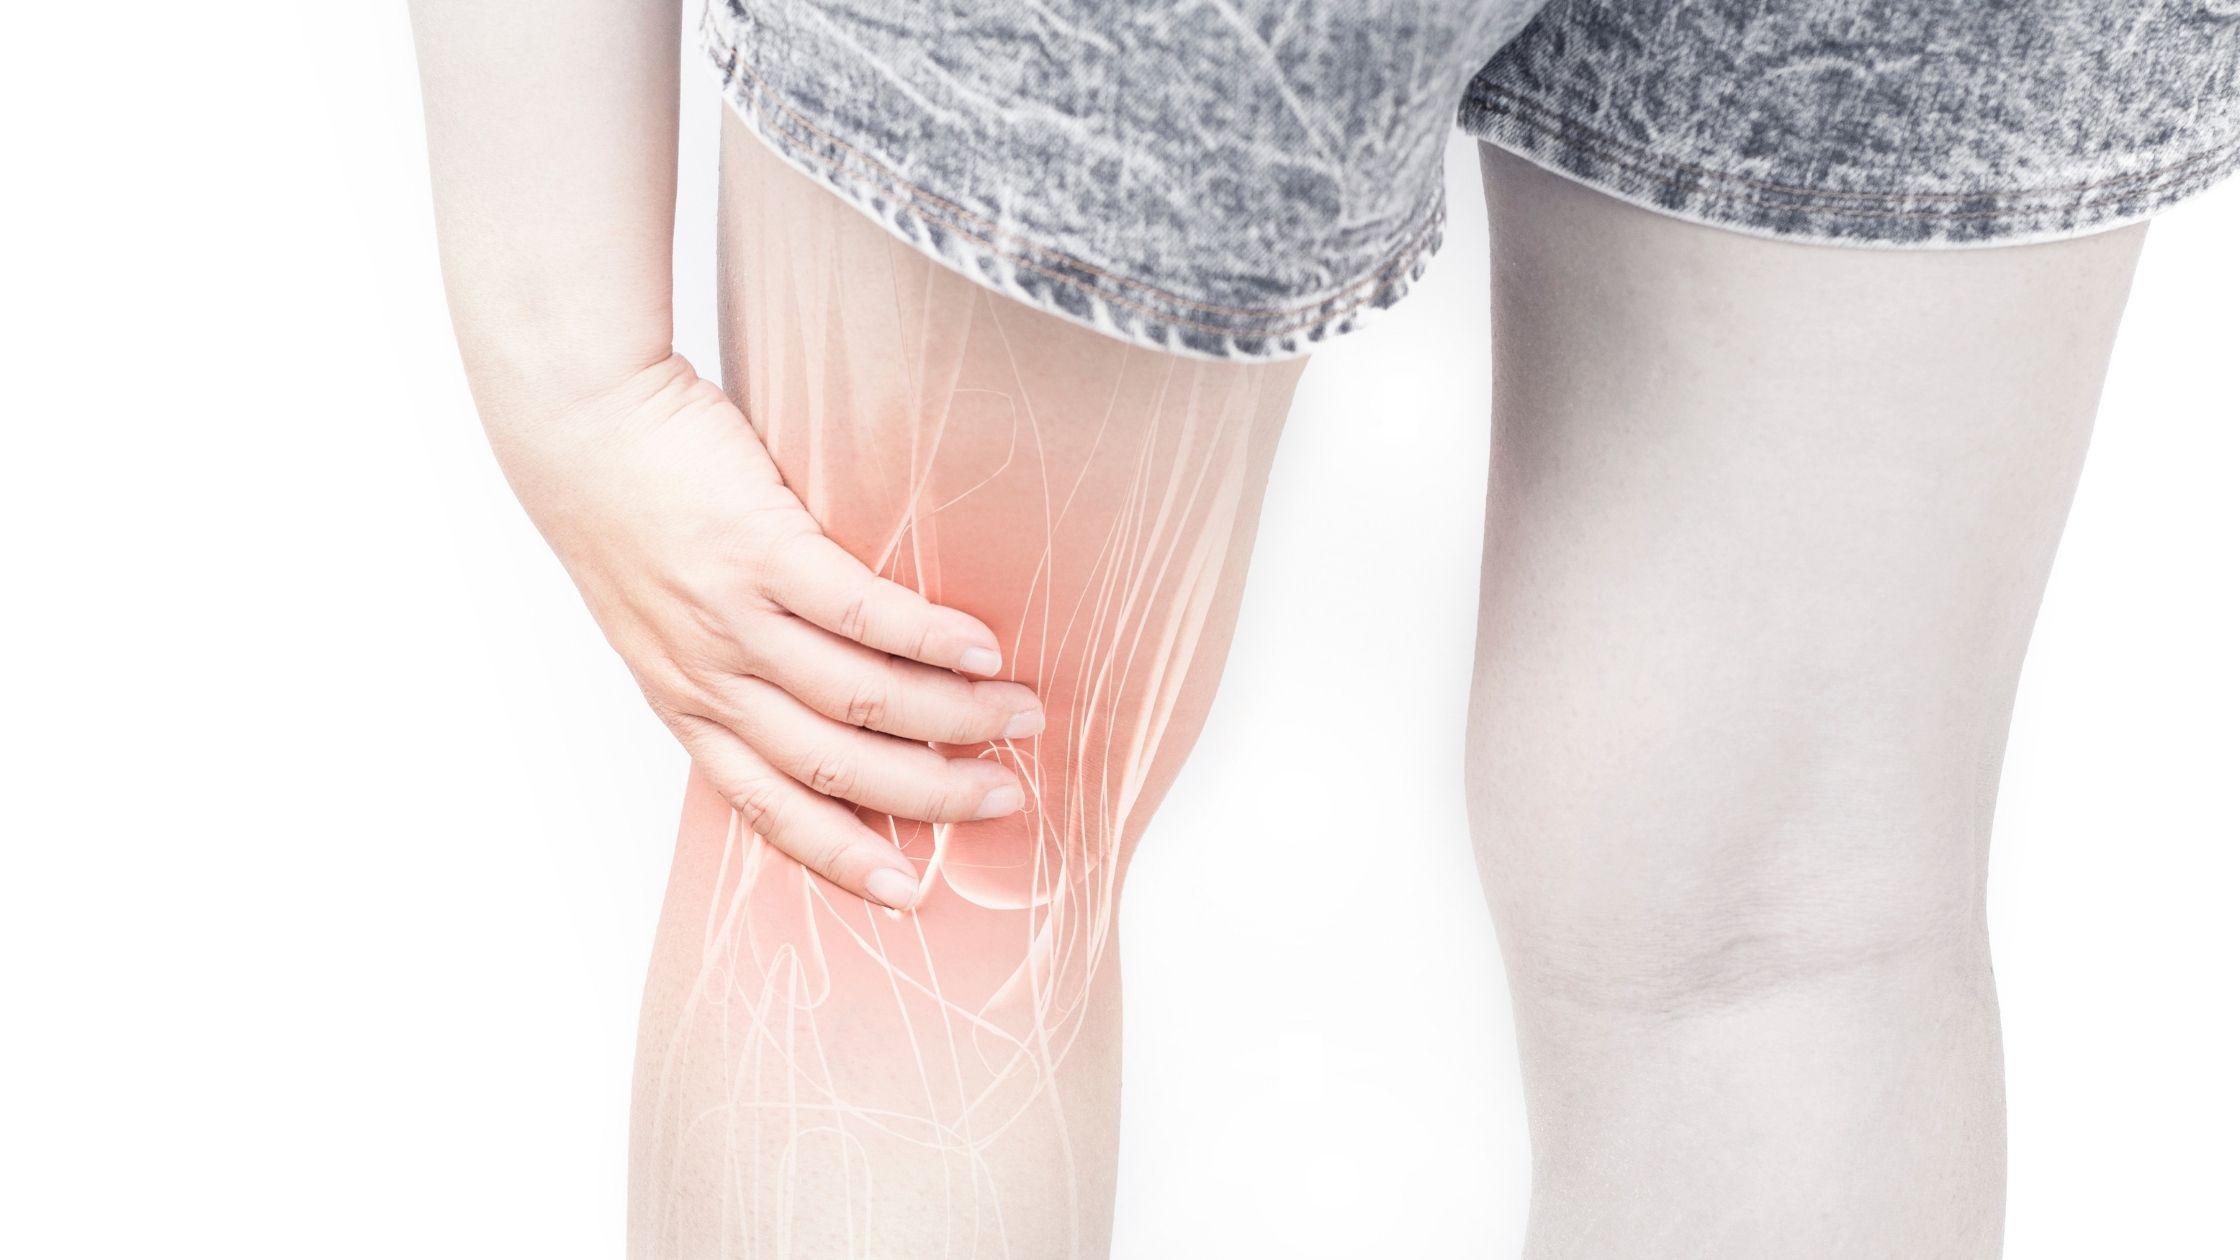 What Causes Leg Cramps on Keto?